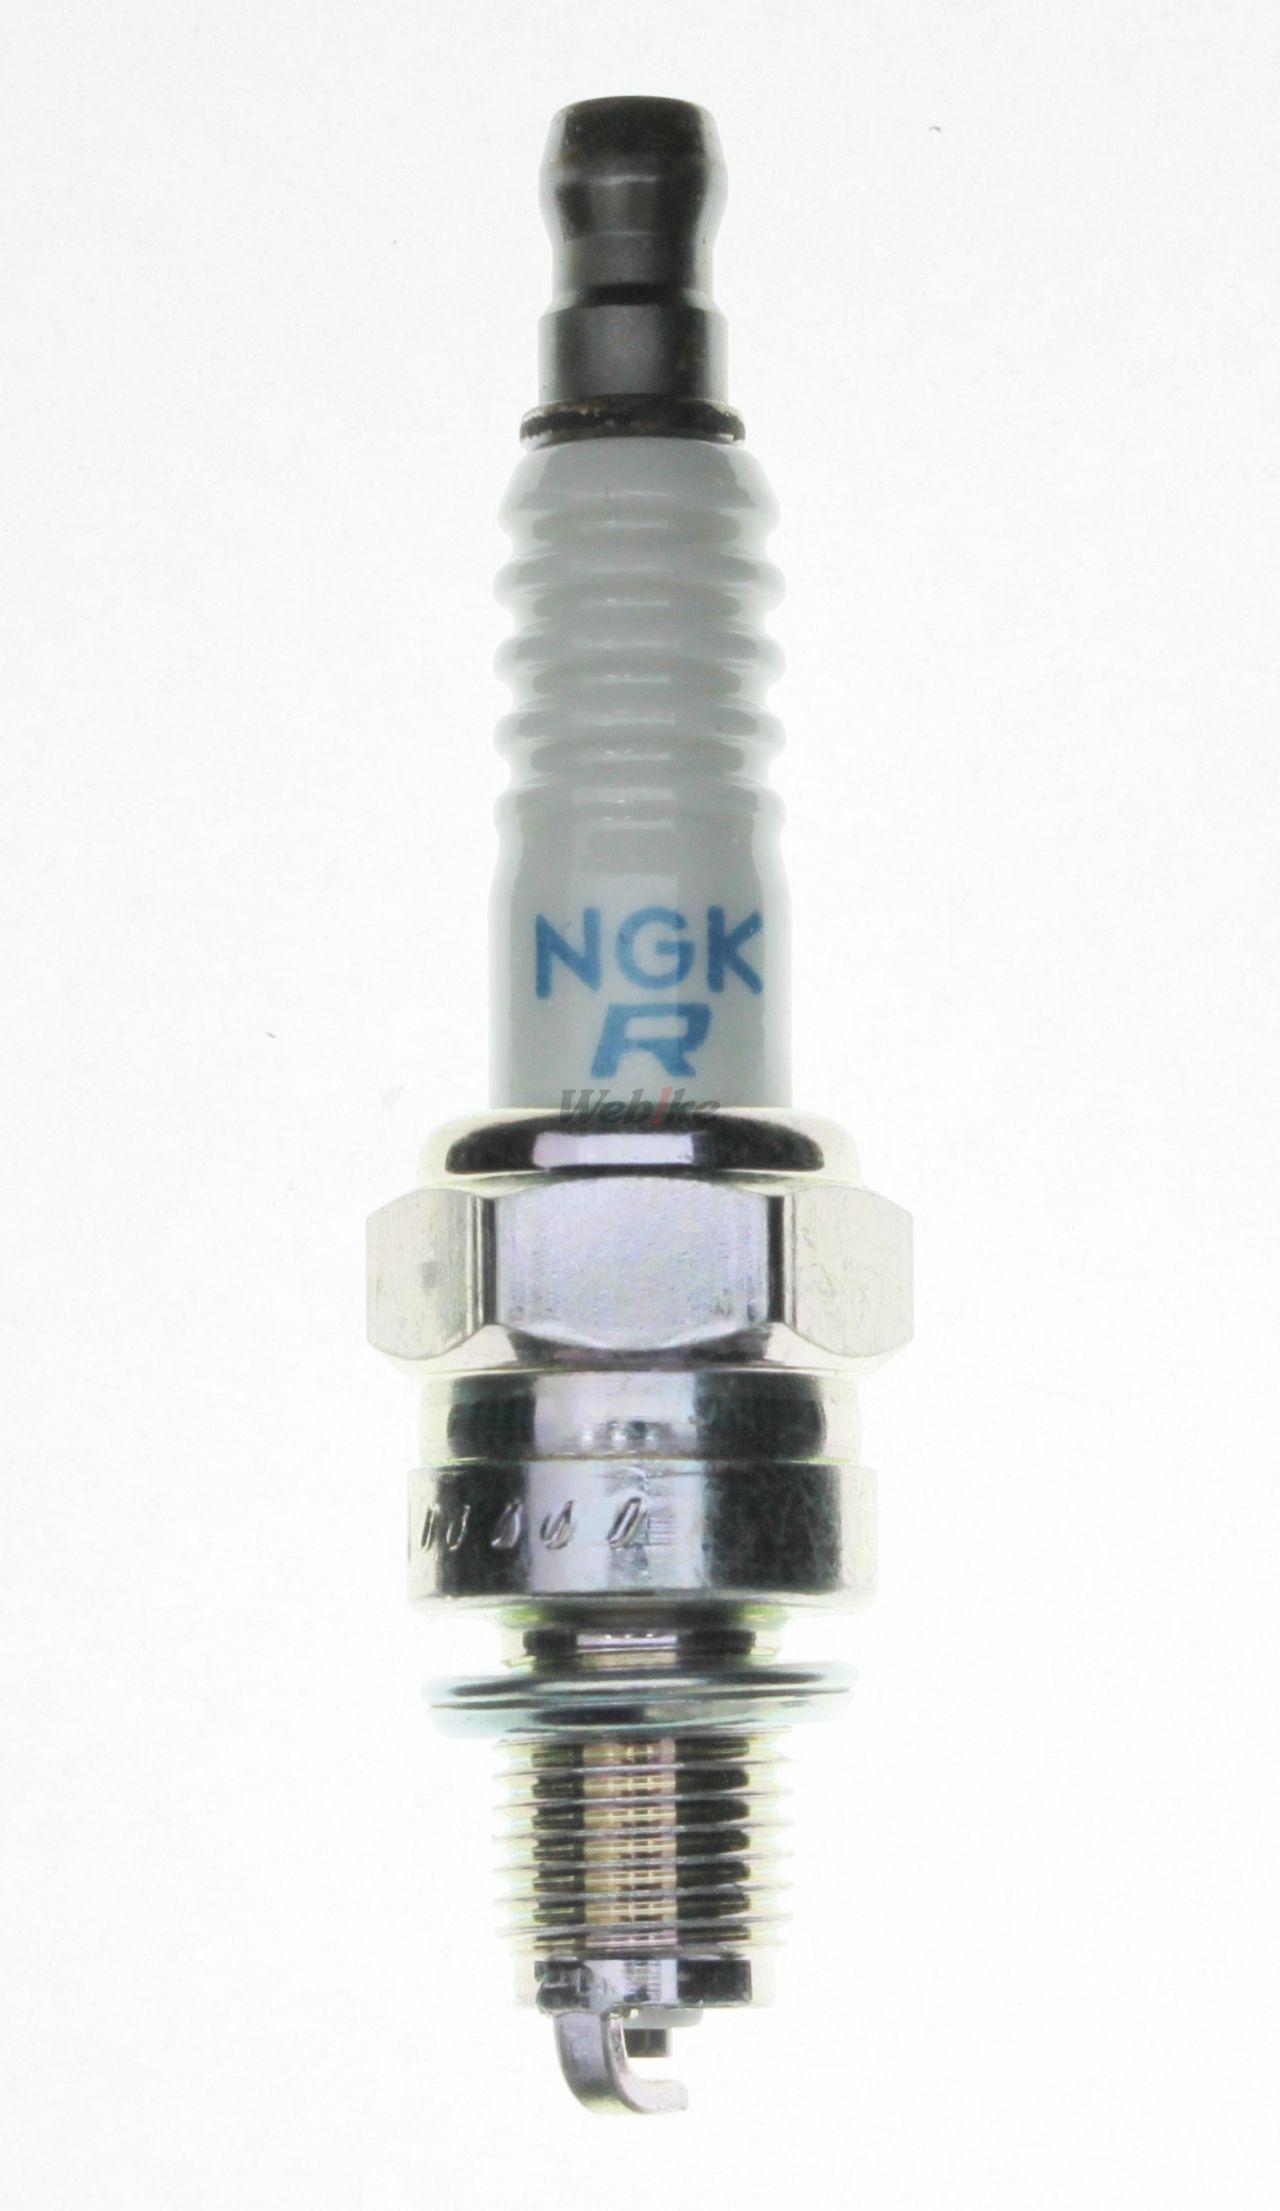 【NGK】標準型 火星塞 CR6HSB 6500 - 「Webike-摩托百貨」